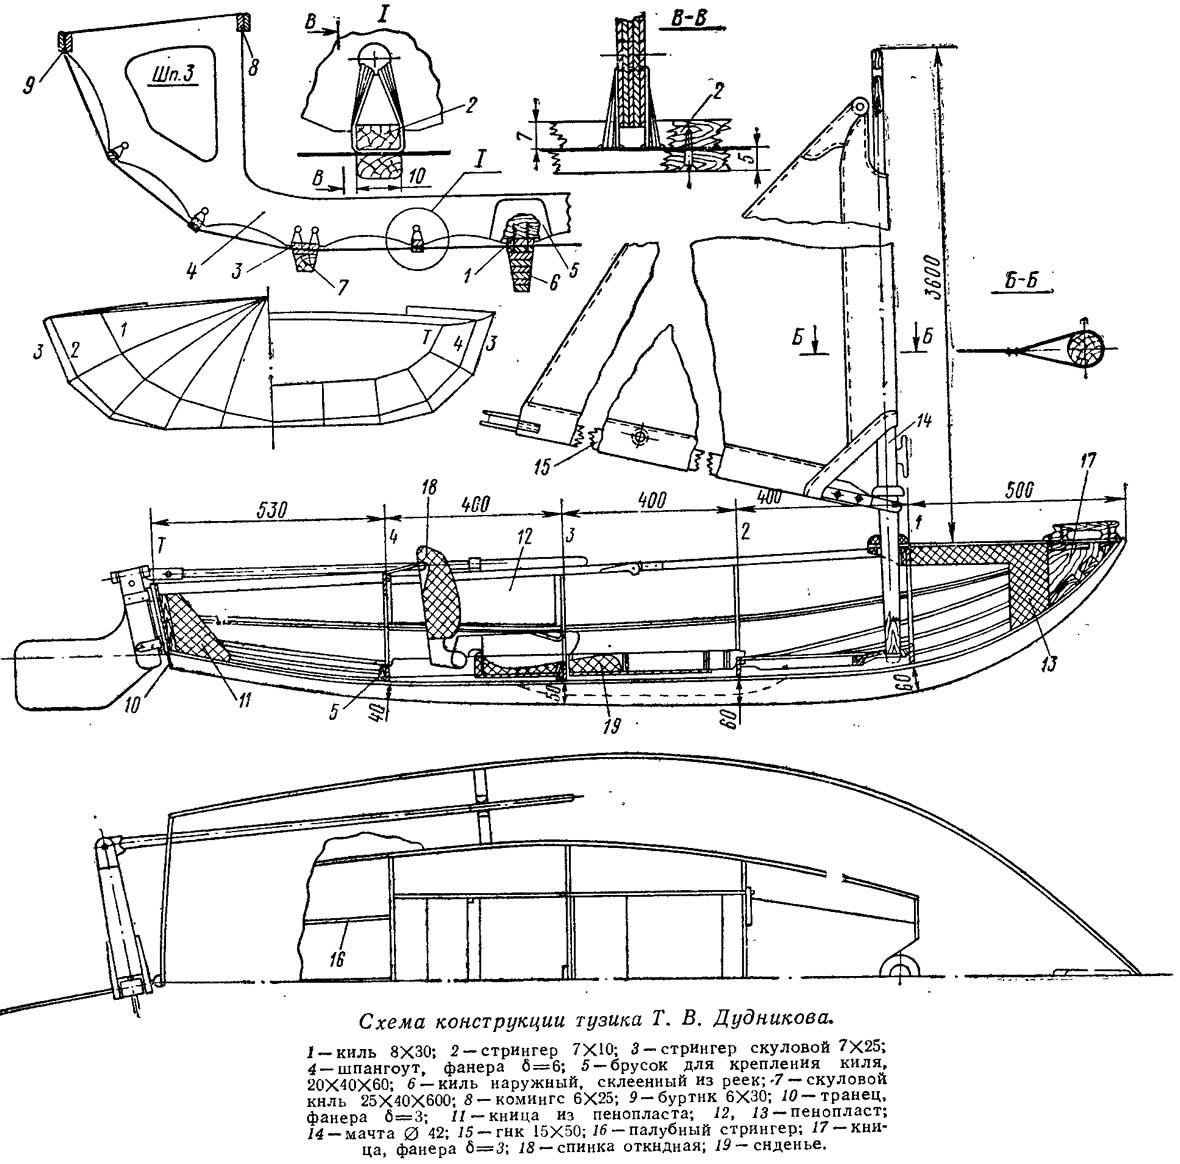 Схема конструкции тузика Т. В. Дудникова